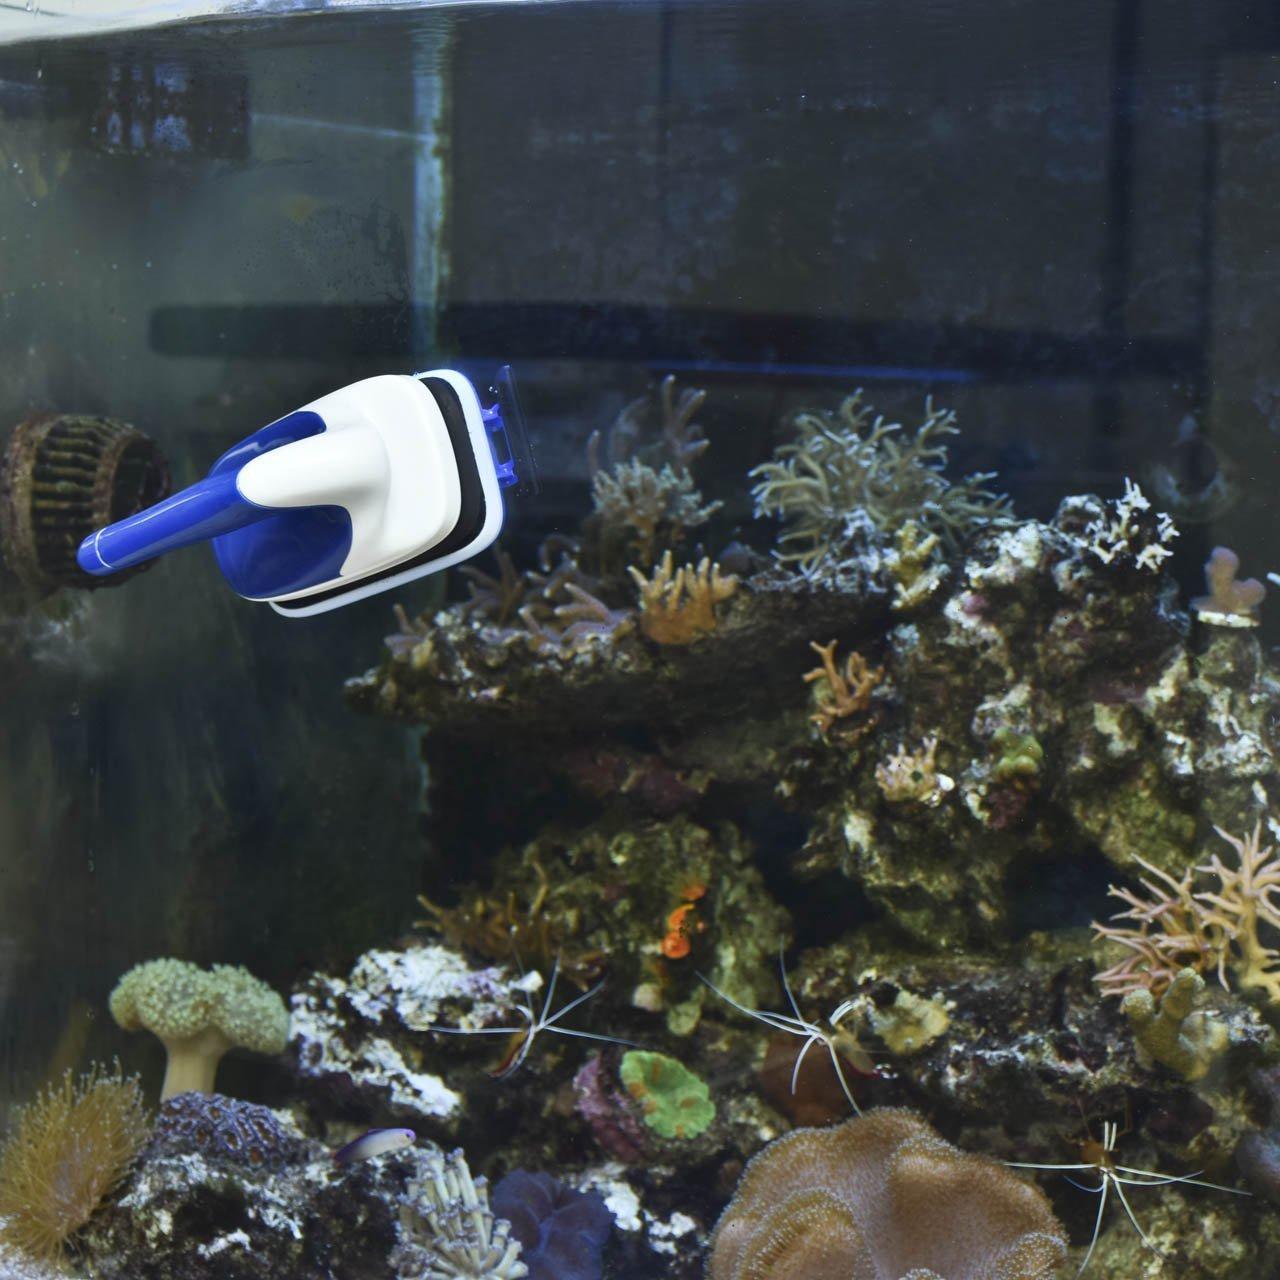 wangxinl Acuario magnética cepillo cristal algas rascador limpiador flotante imán Acuario Limpieza Limpiador de ventanas Acuario Accesorio para Acuario Azul ...